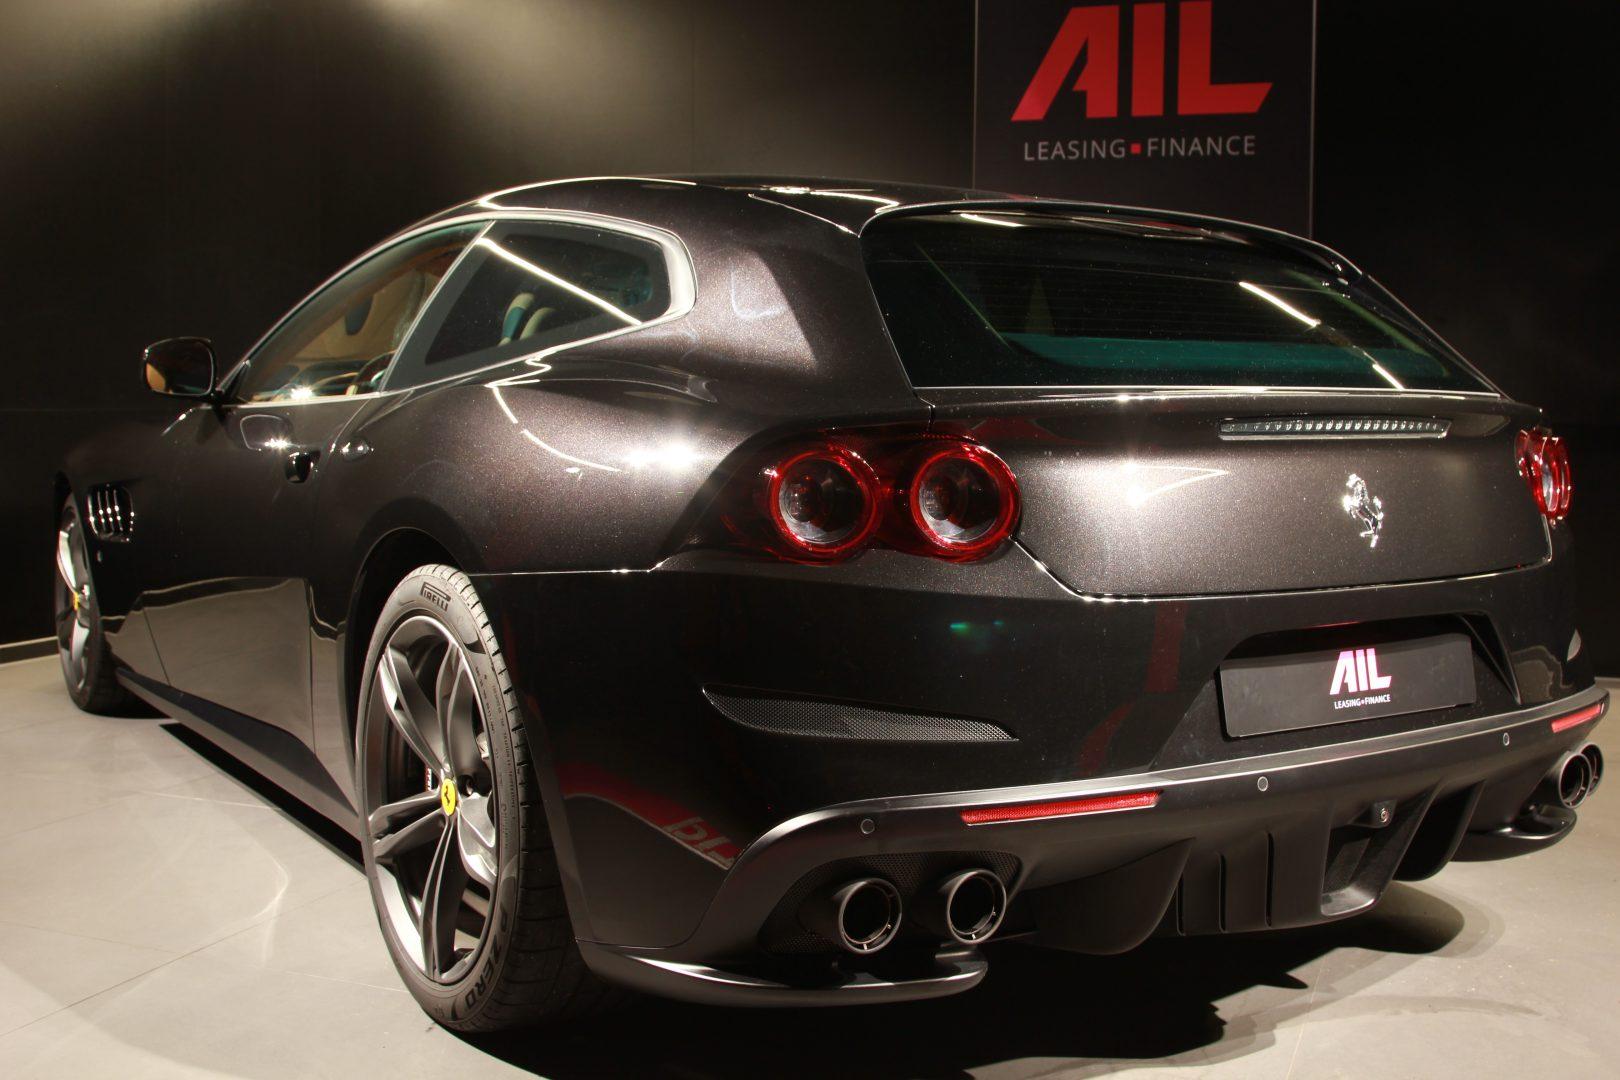 AIL Ferrari GTC4Lusso 3